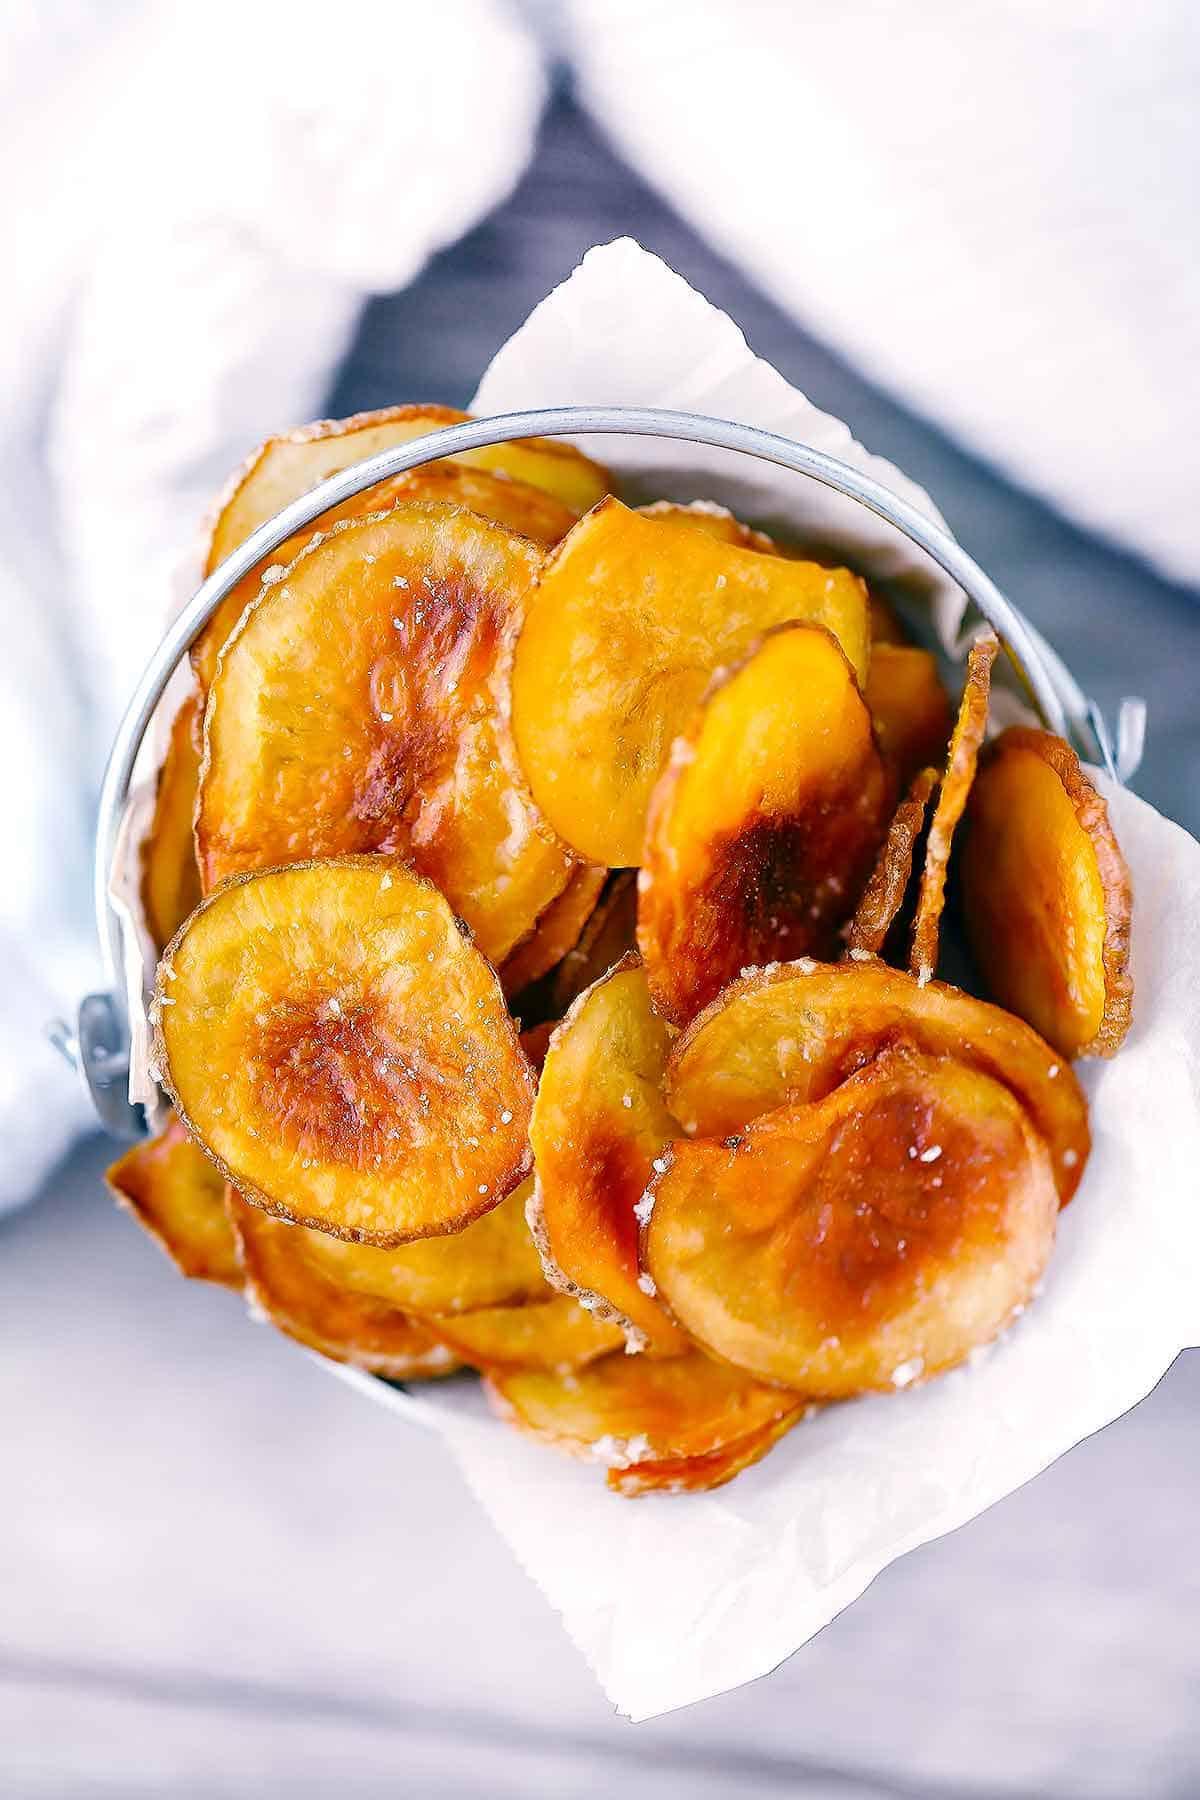 Homemade oven-baked potato chips overhead photo.